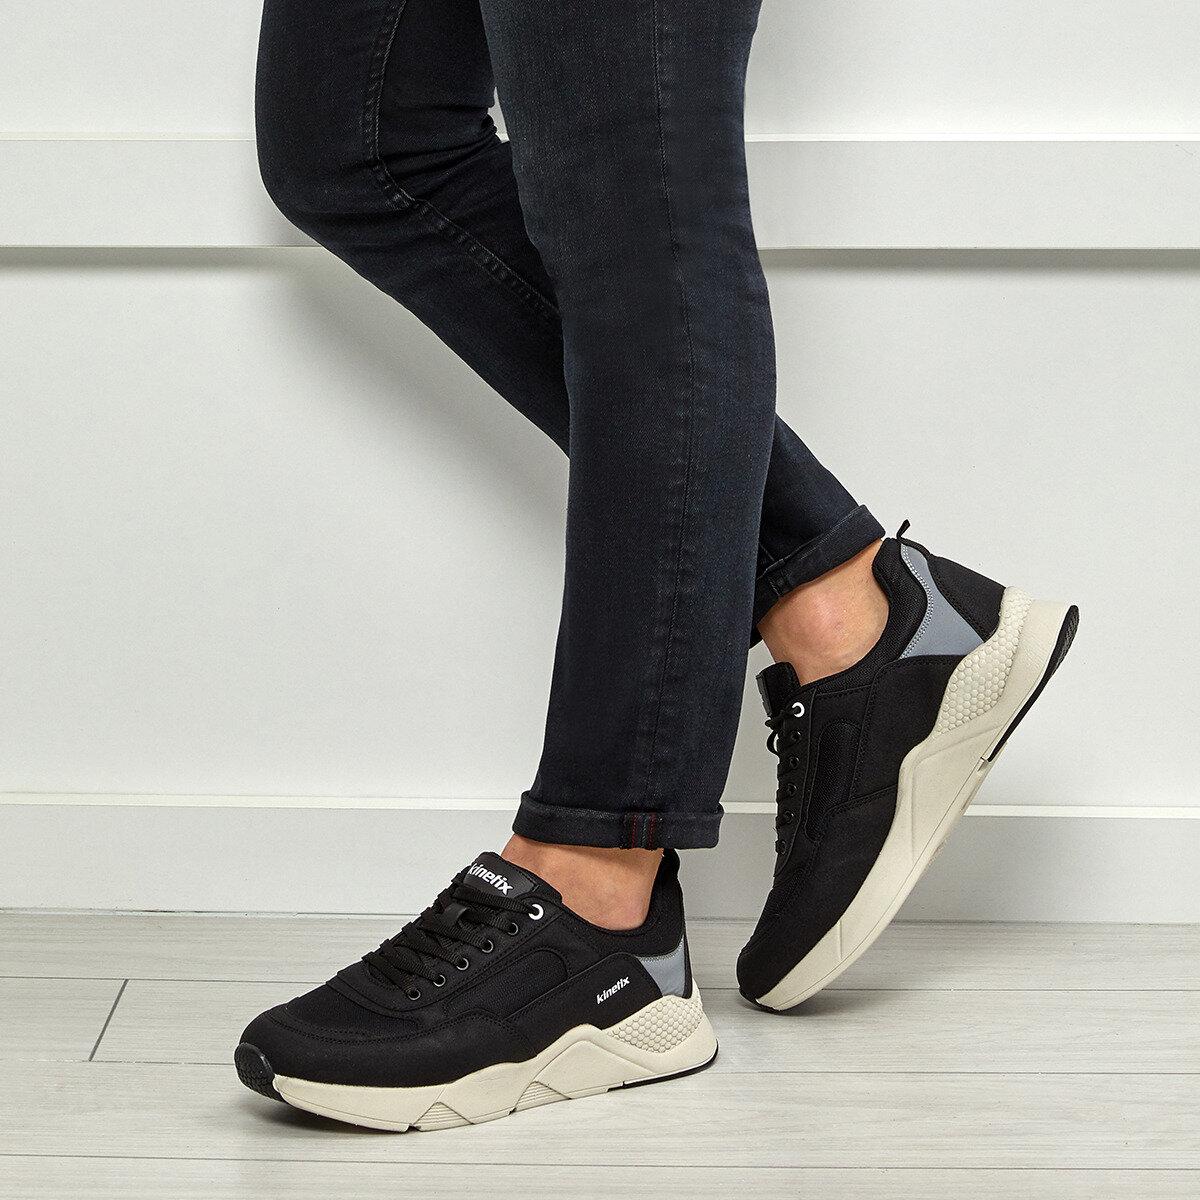 FLO LAVERY Black Male Sports Shoes KINETIX